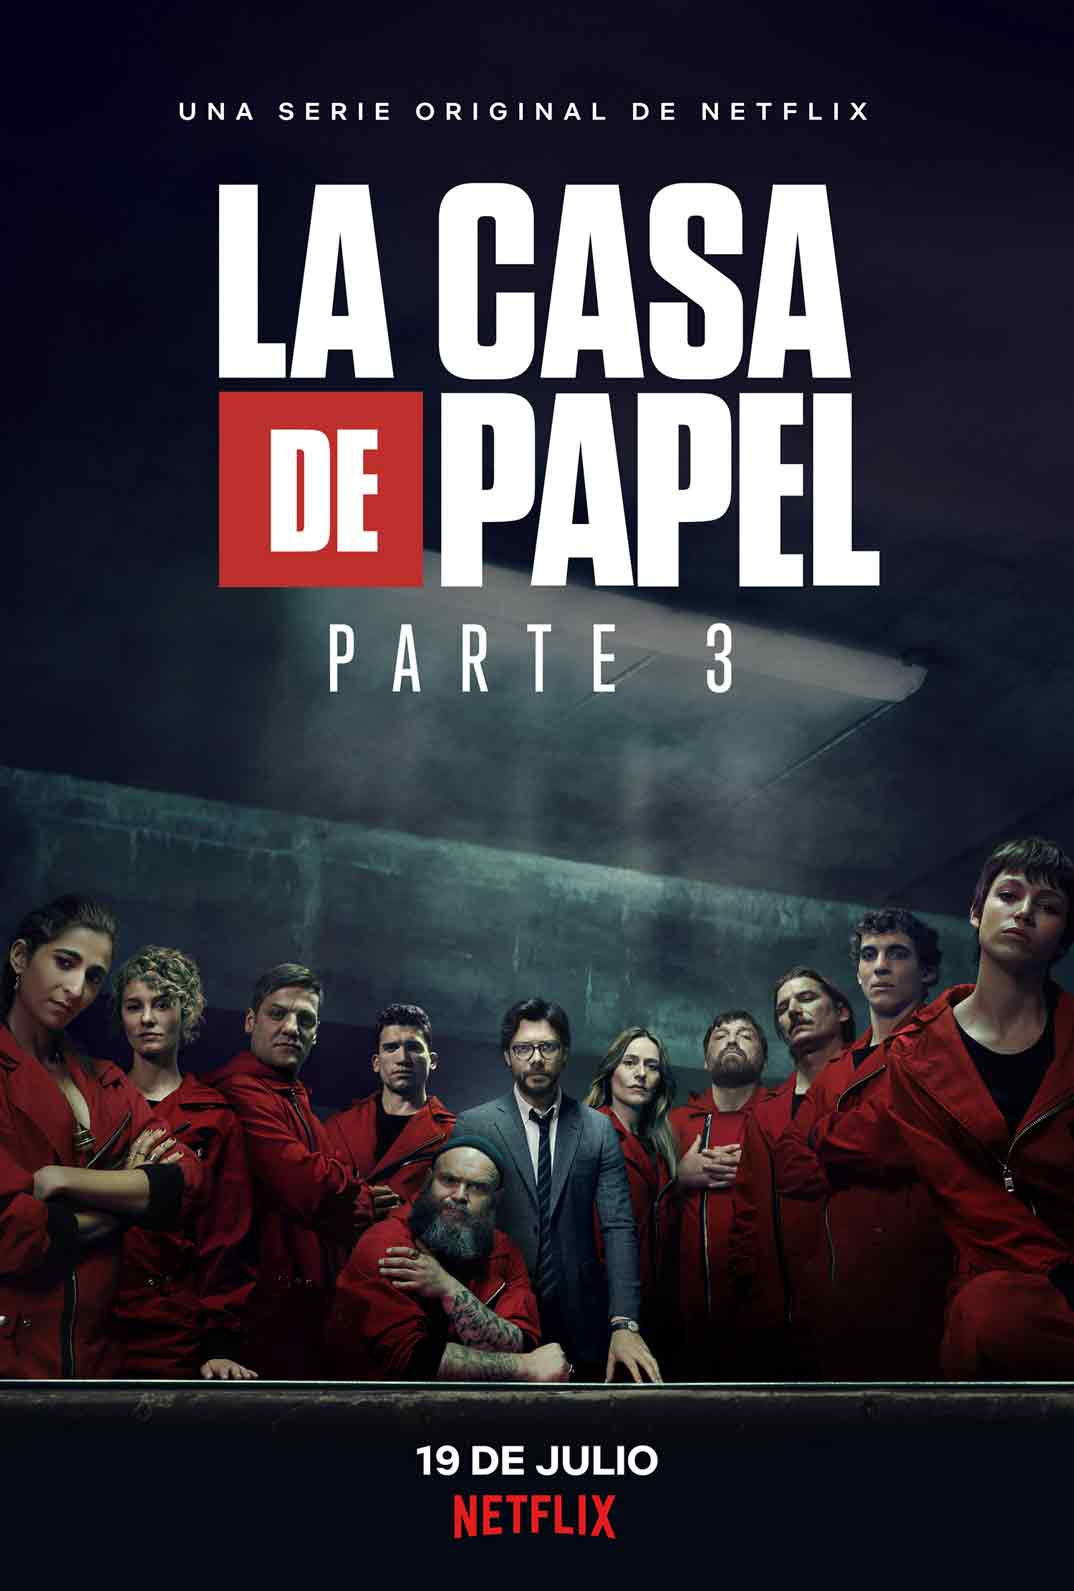 La casa de papel - Parte 3 © Netflix